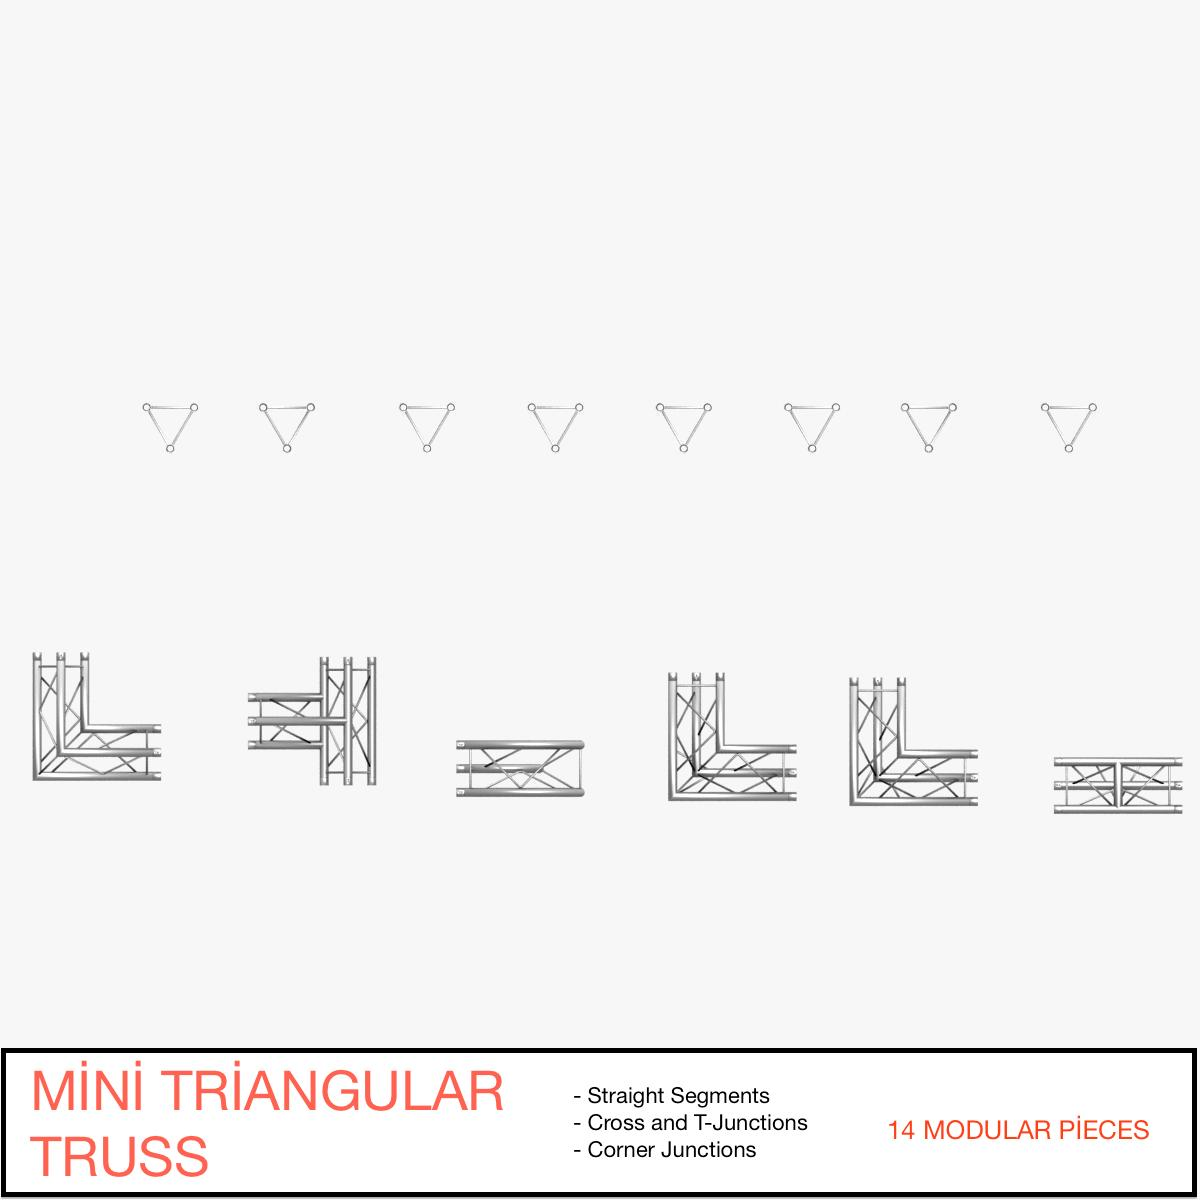 triangular trusses (collection 55 modular pieces) 3d model 3ds max dxf fbx c4d dae texture obj 216213